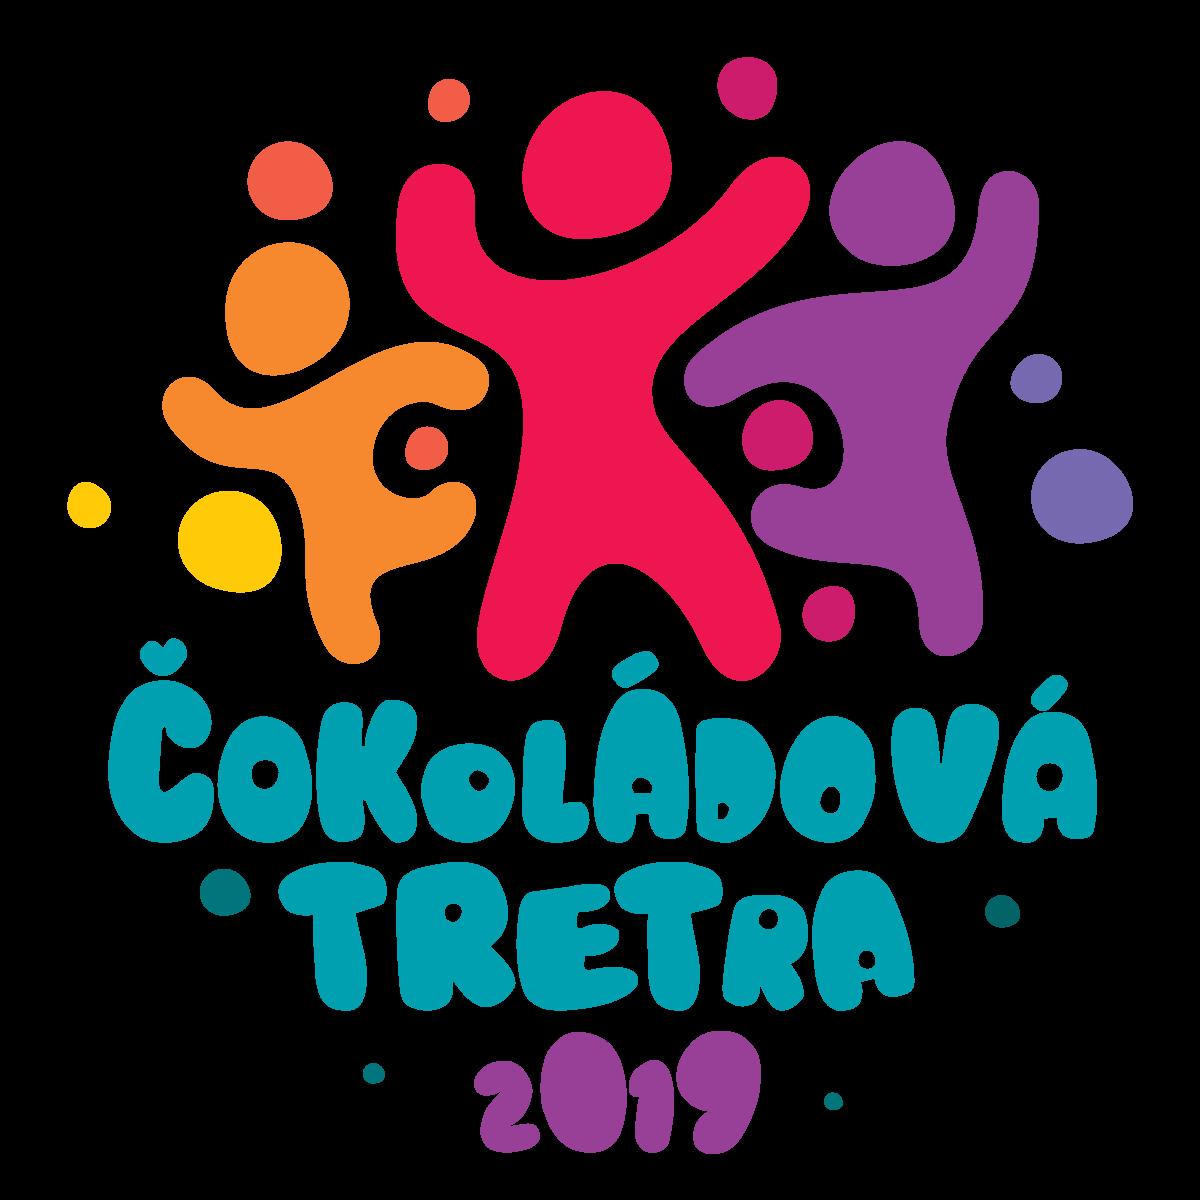 cokoladova_tretra_logo-2019a